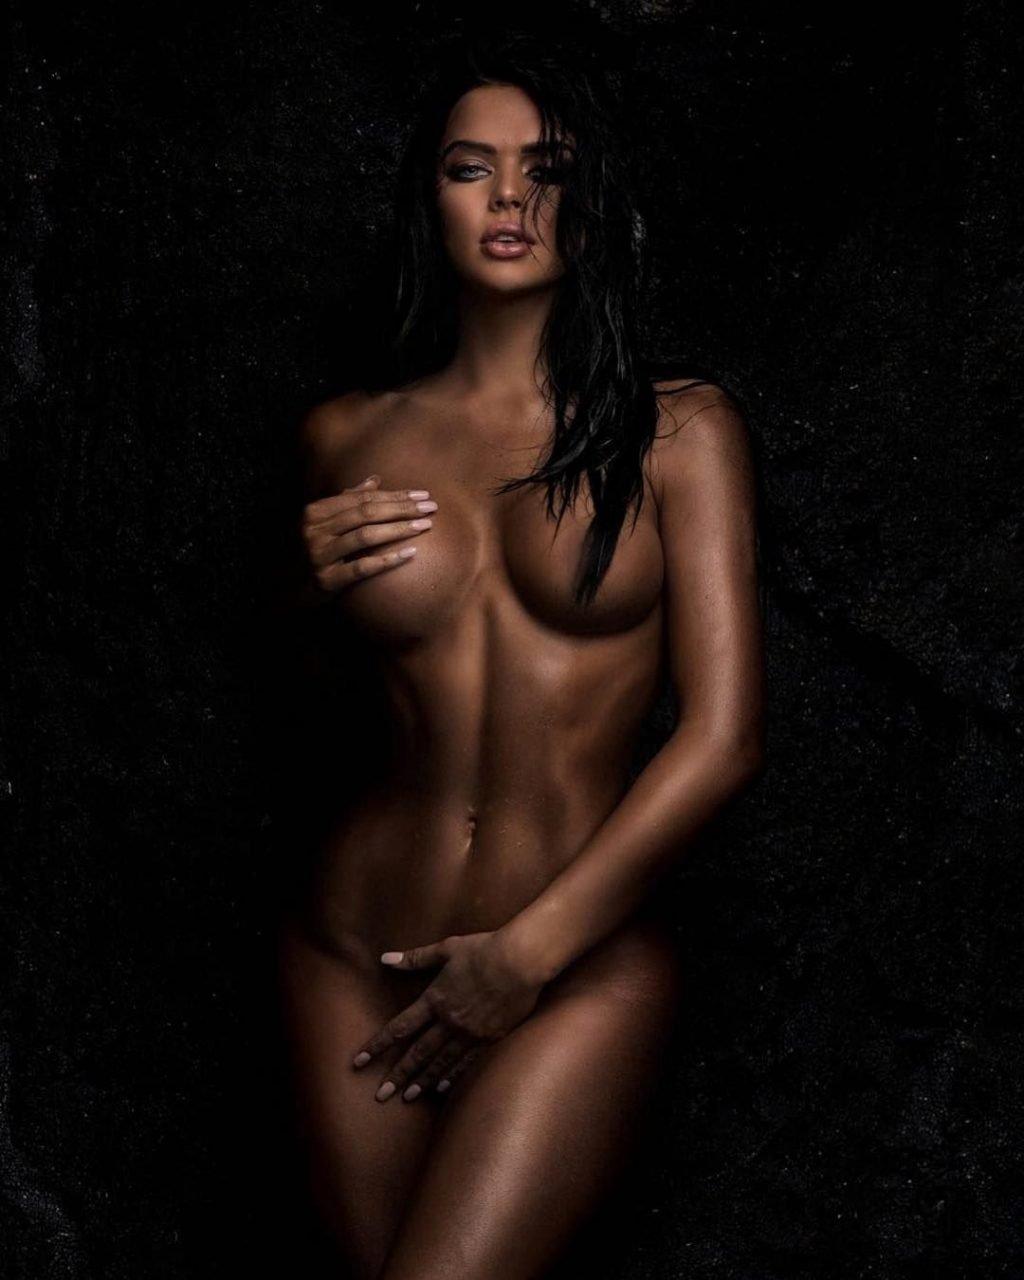 Kelsie Jean Smeby Nude & Sexy (164 Photos)